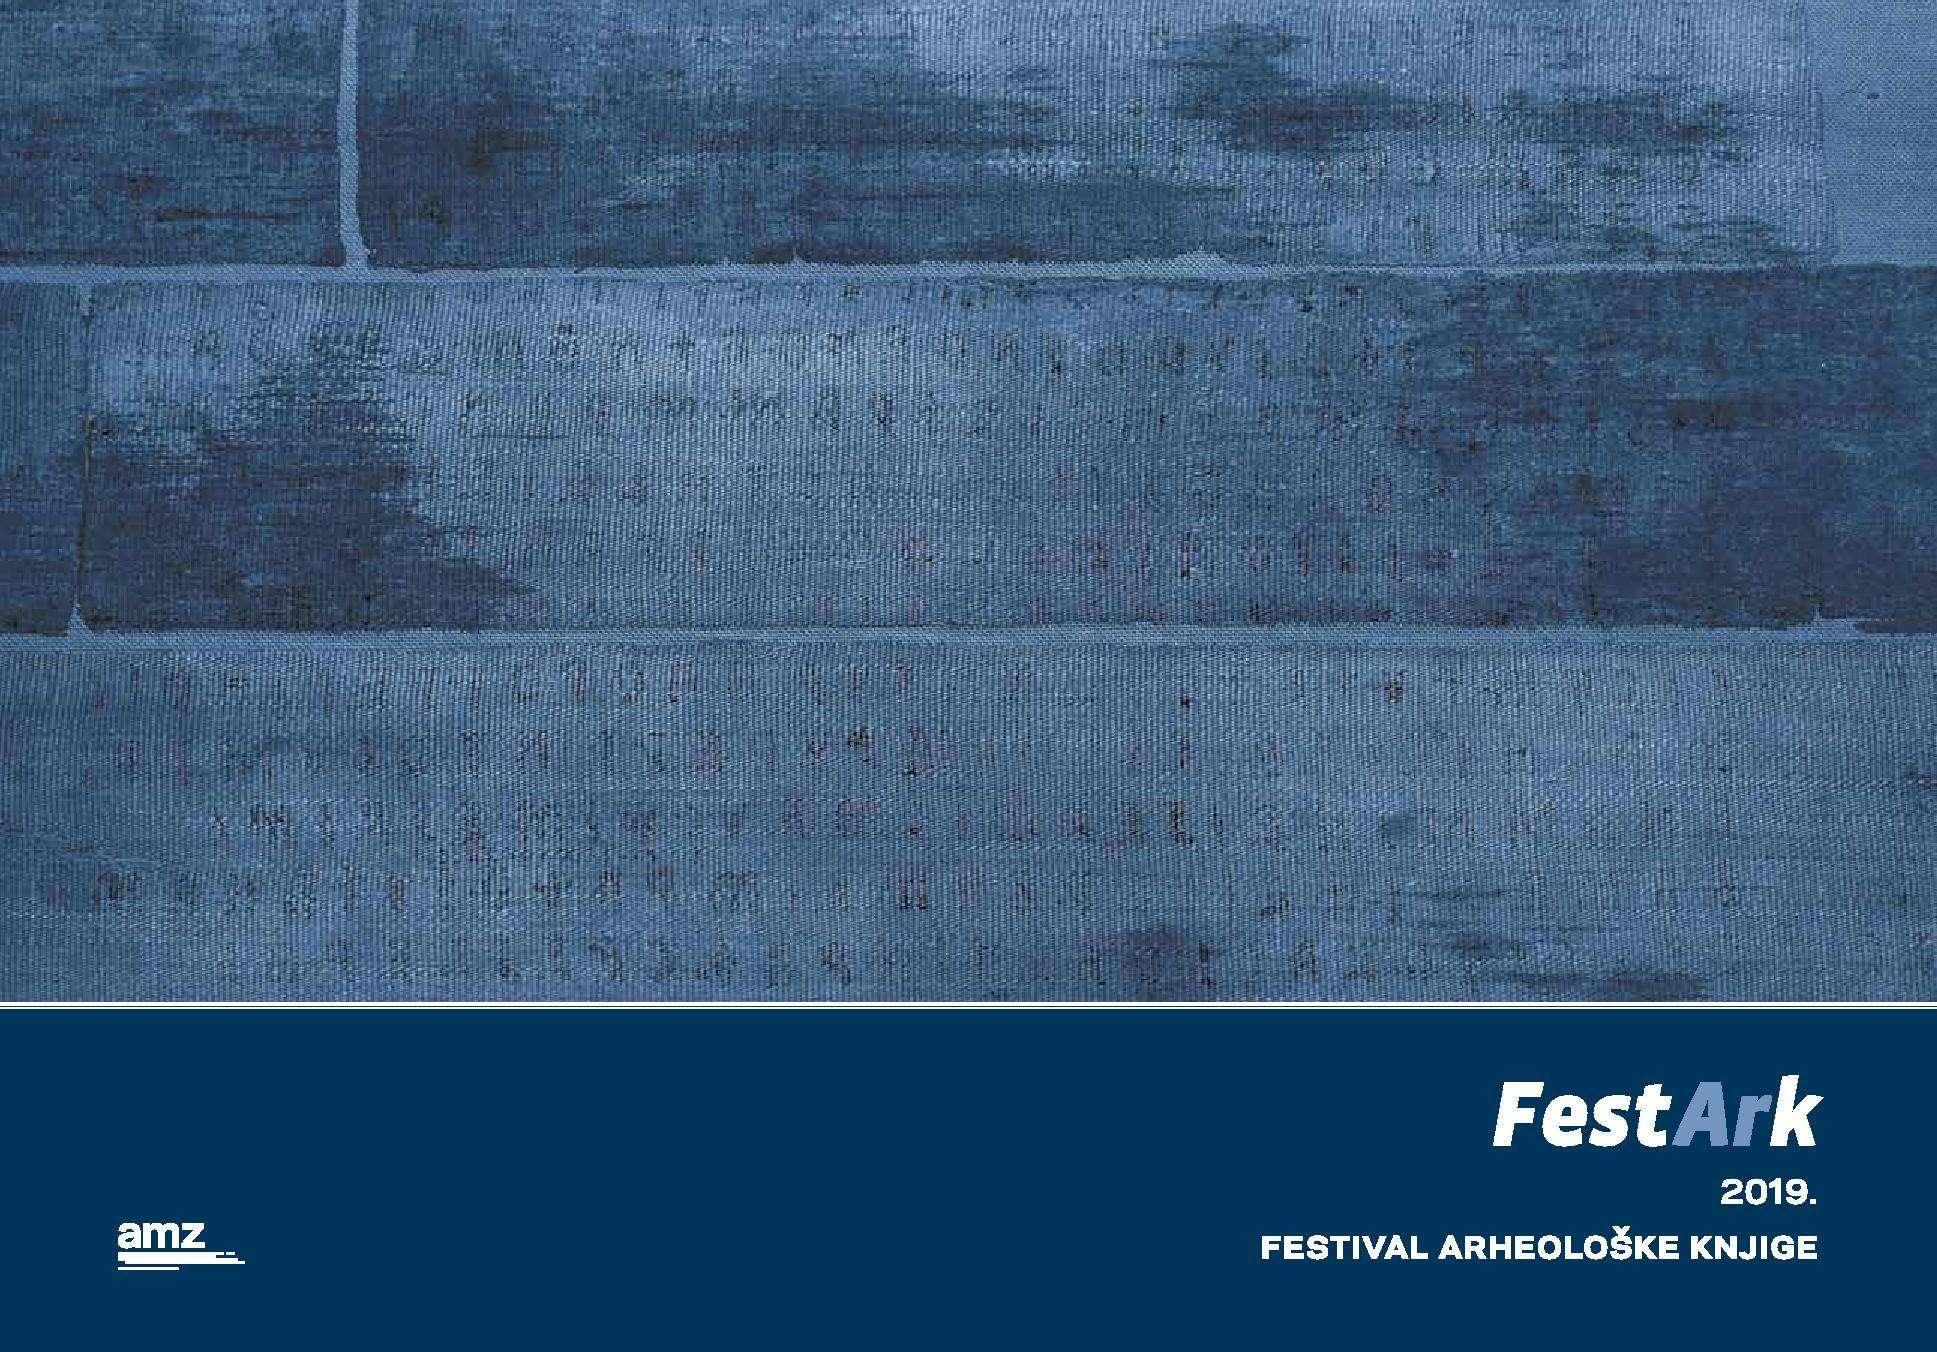 'FestArK' – 1. Festival arheološke knjige